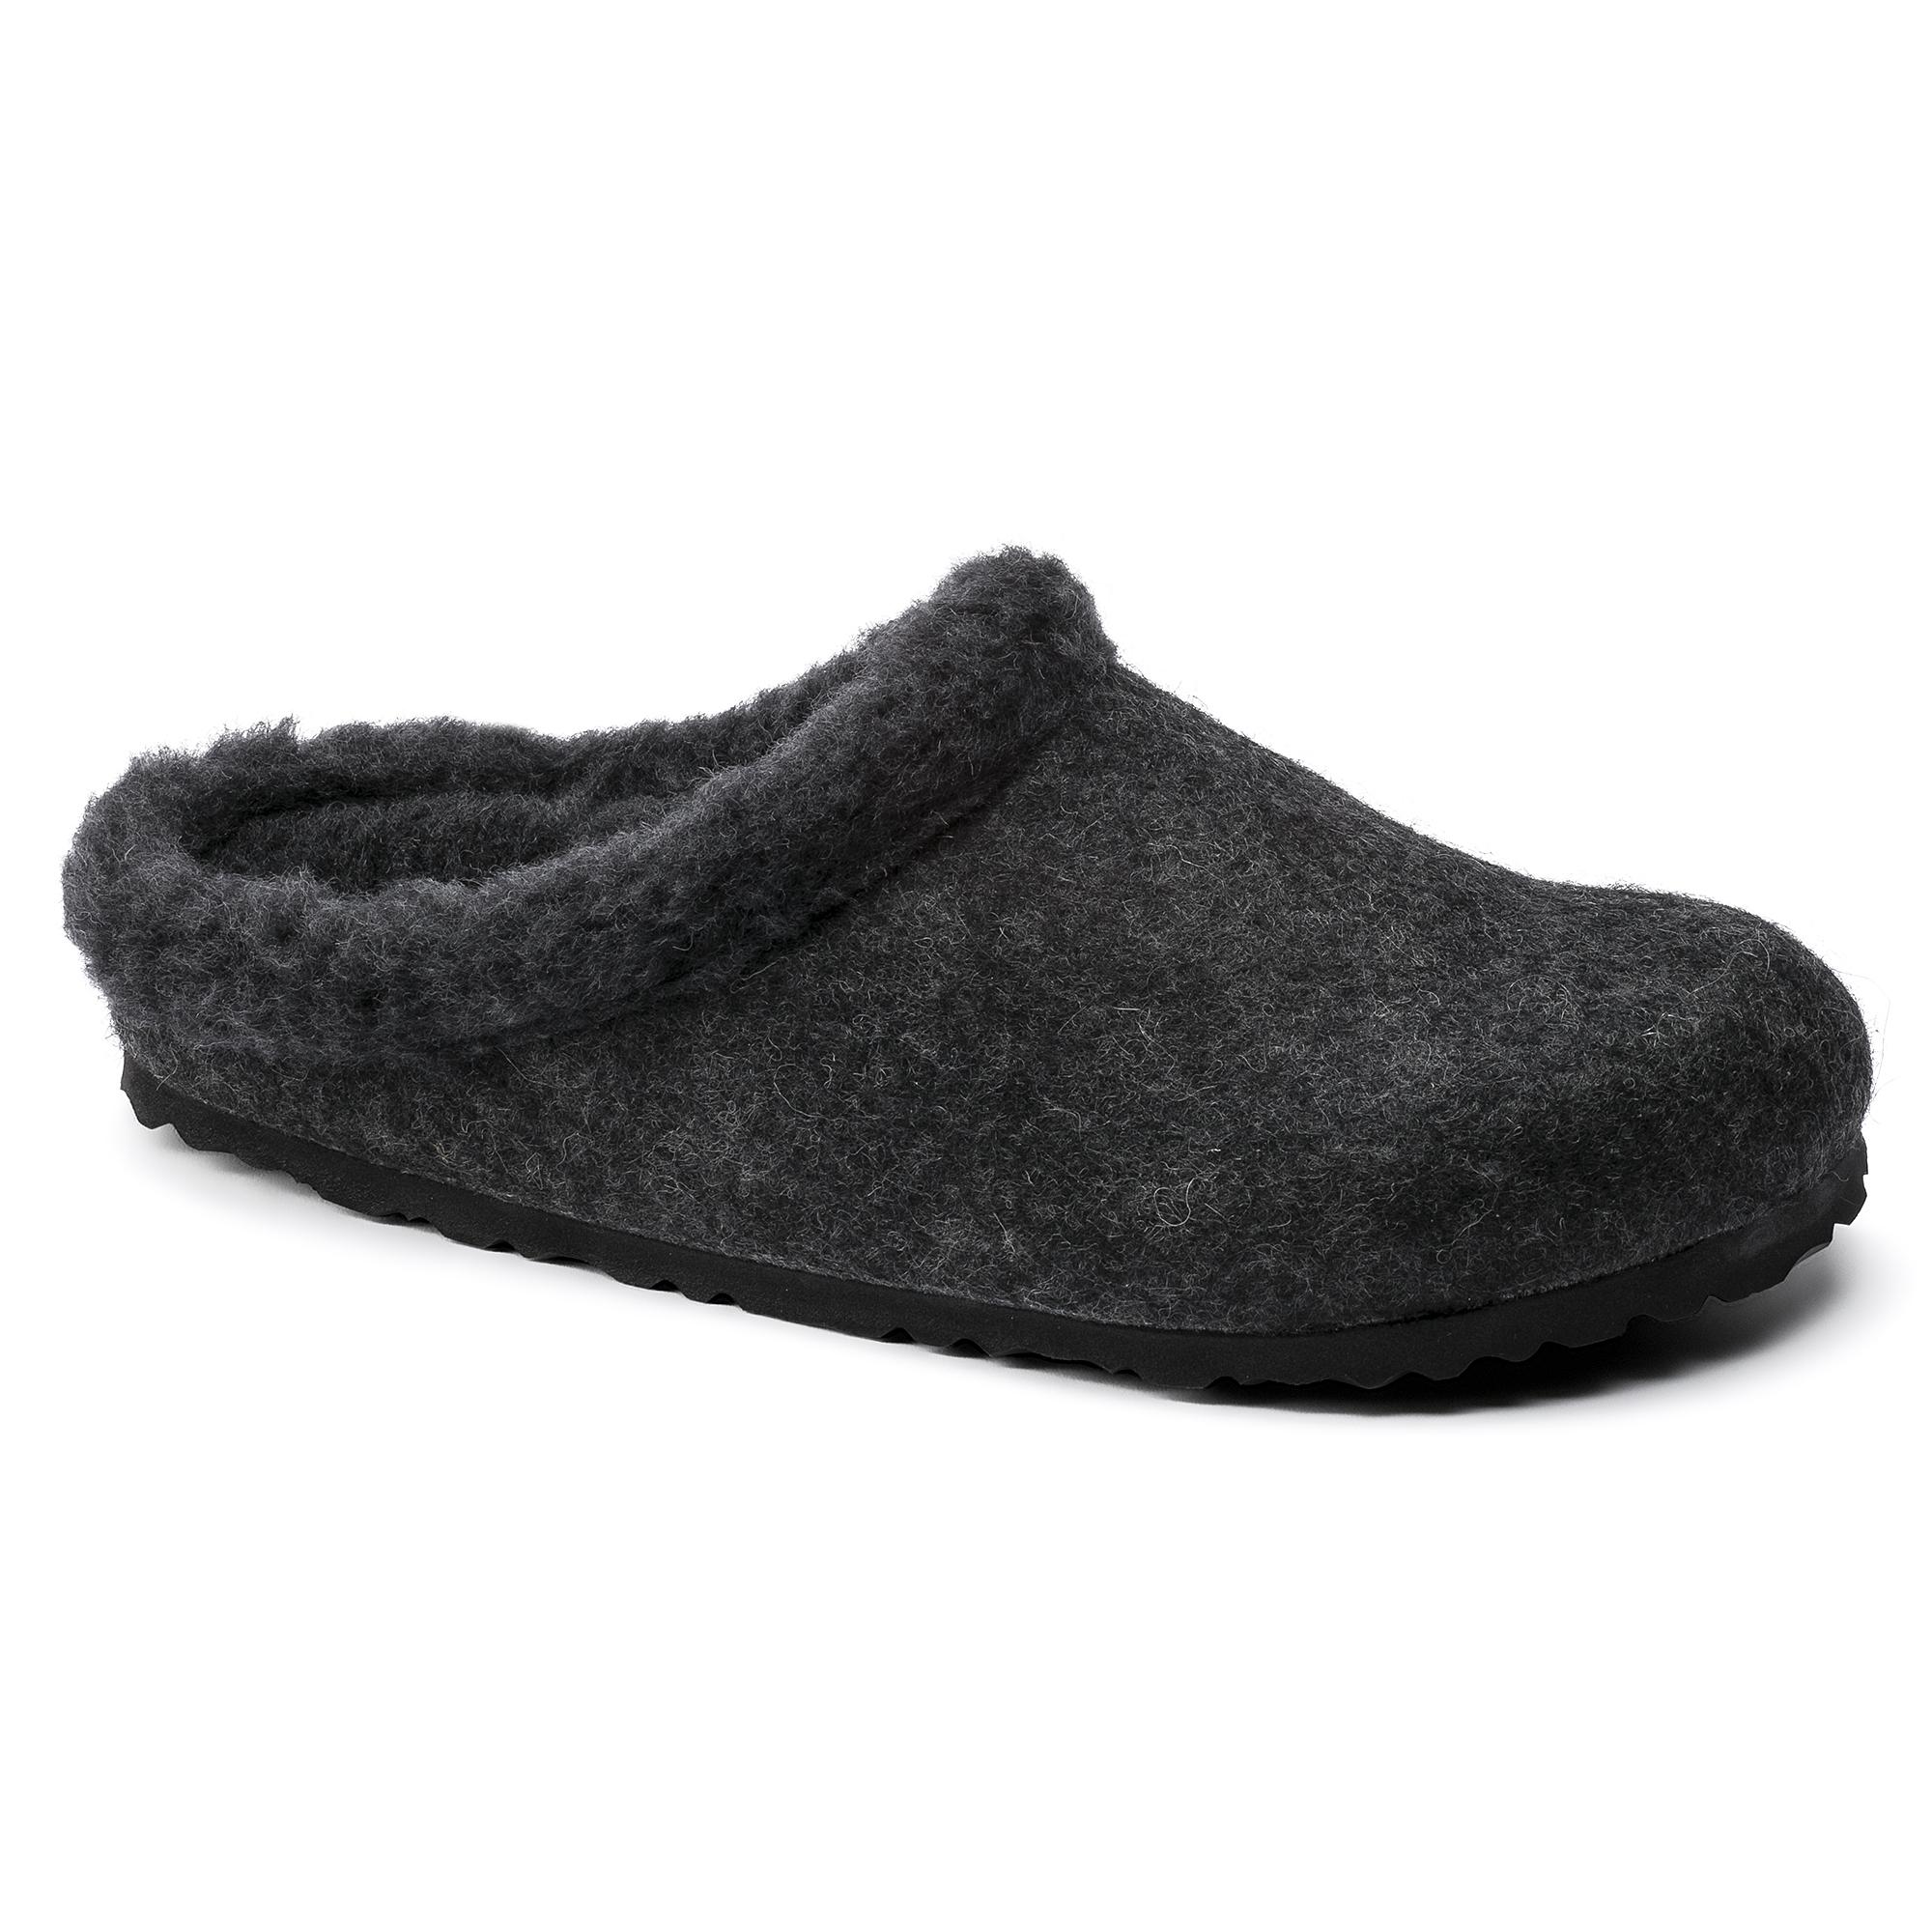 a28ca6b1cd45 Kaprun Wool Felt Anthracite Happy Lamb Black